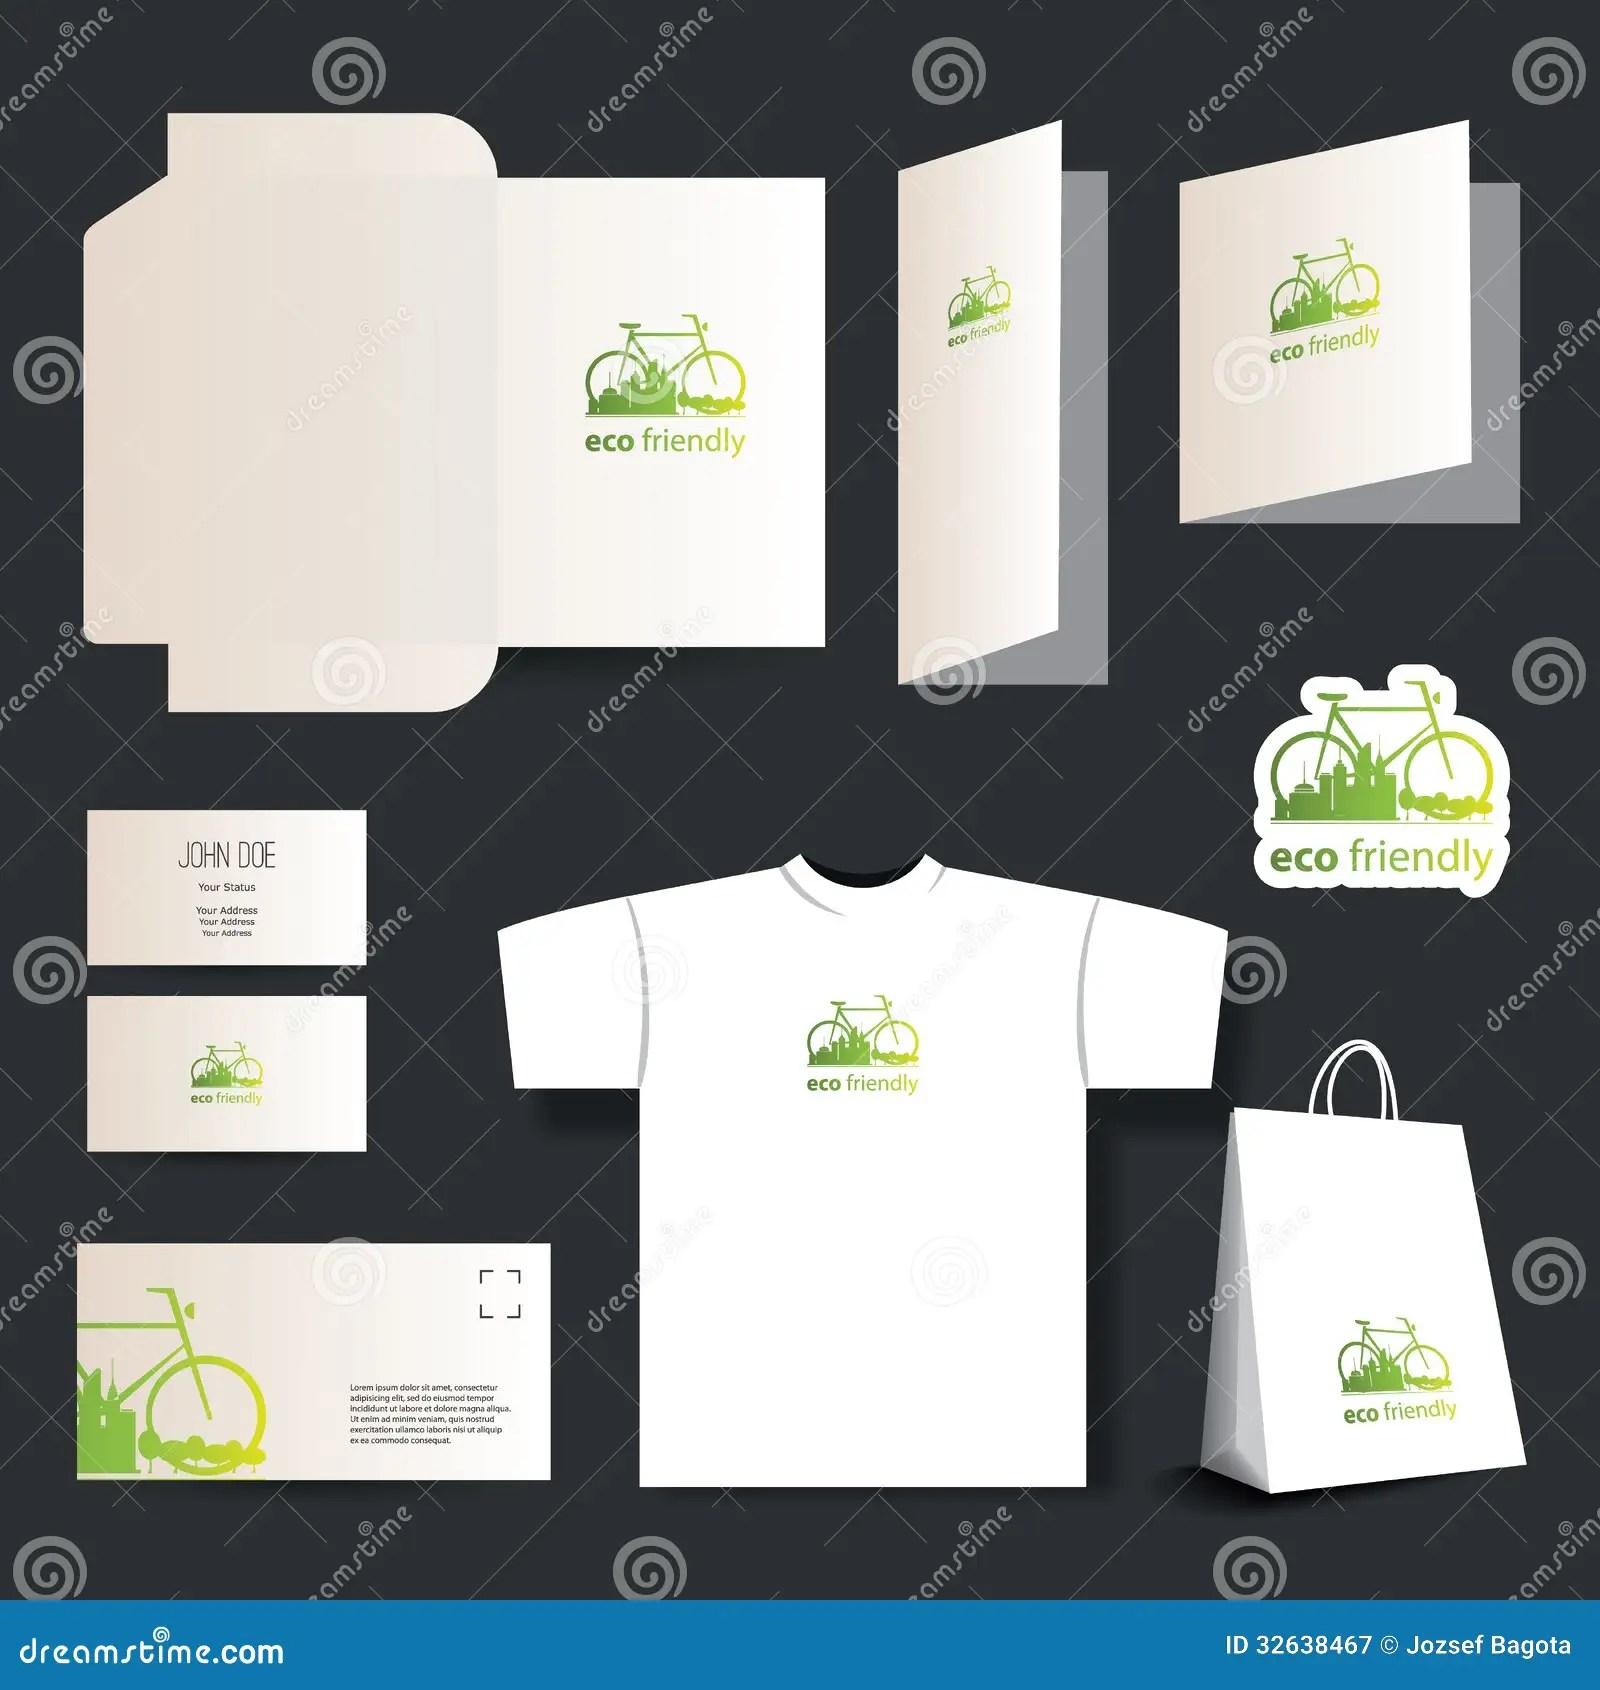 5 X 6 Envelope Template